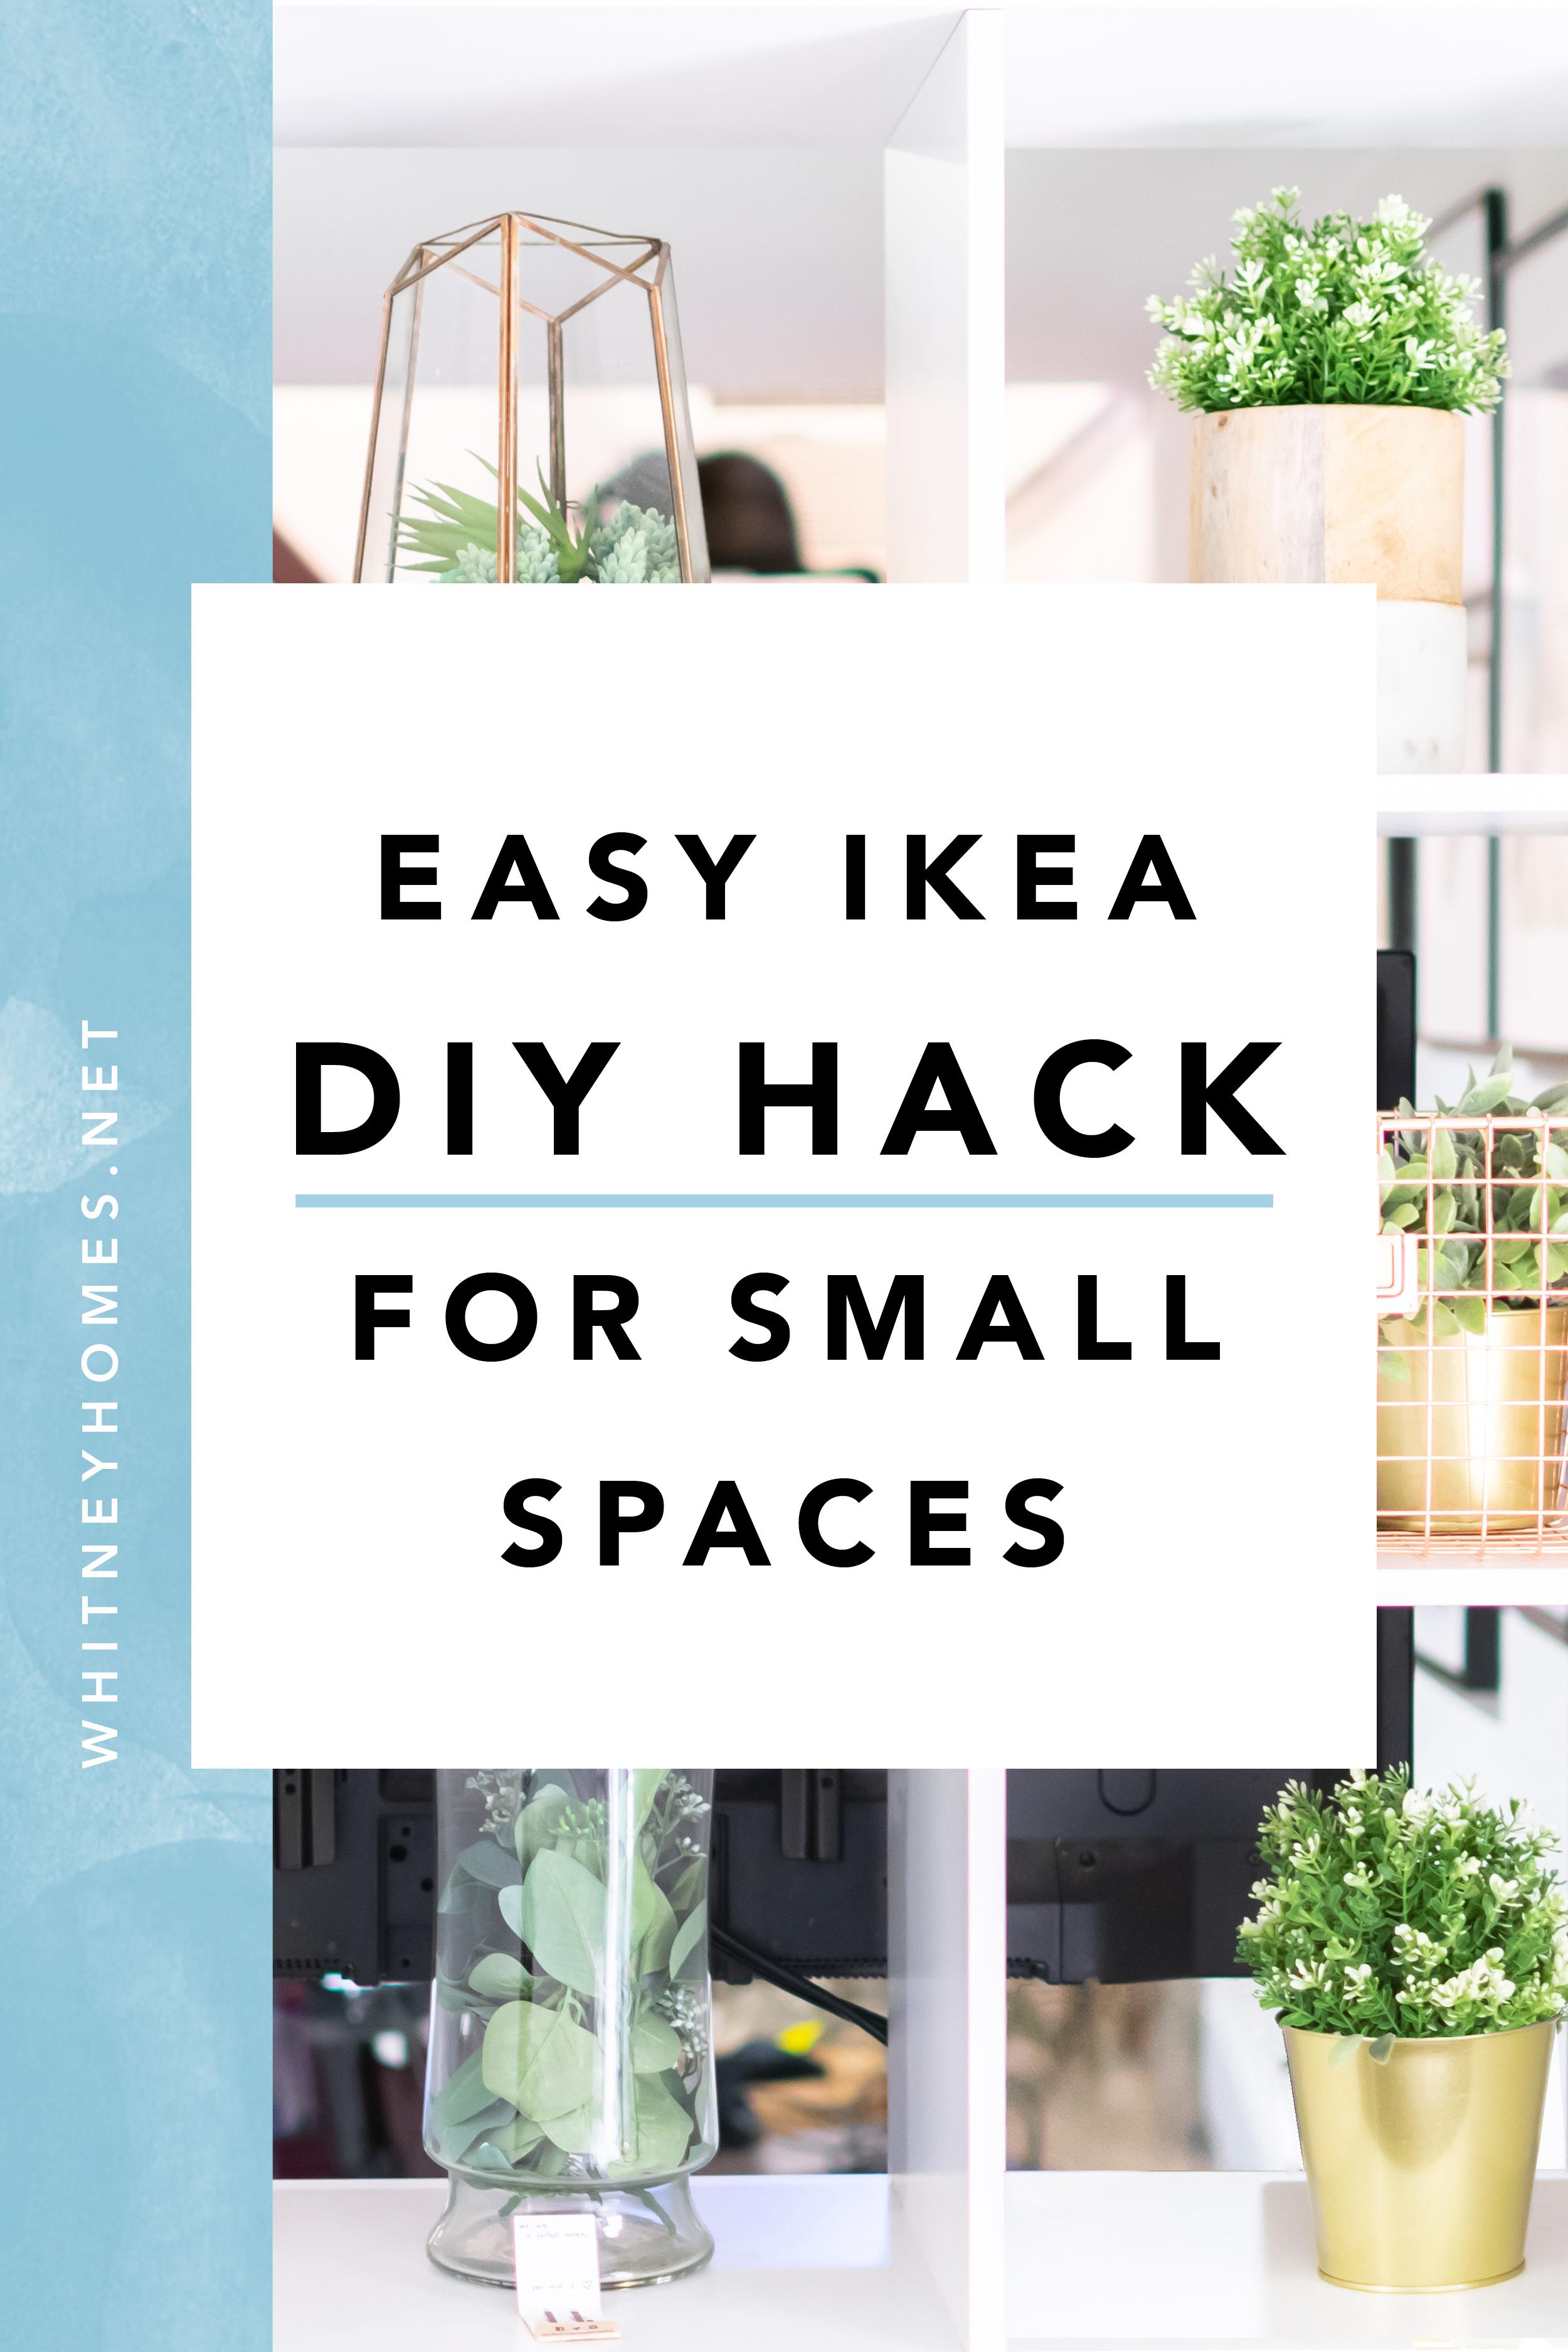 WH_Blog_DIY-Ikea-Hack13.jpg